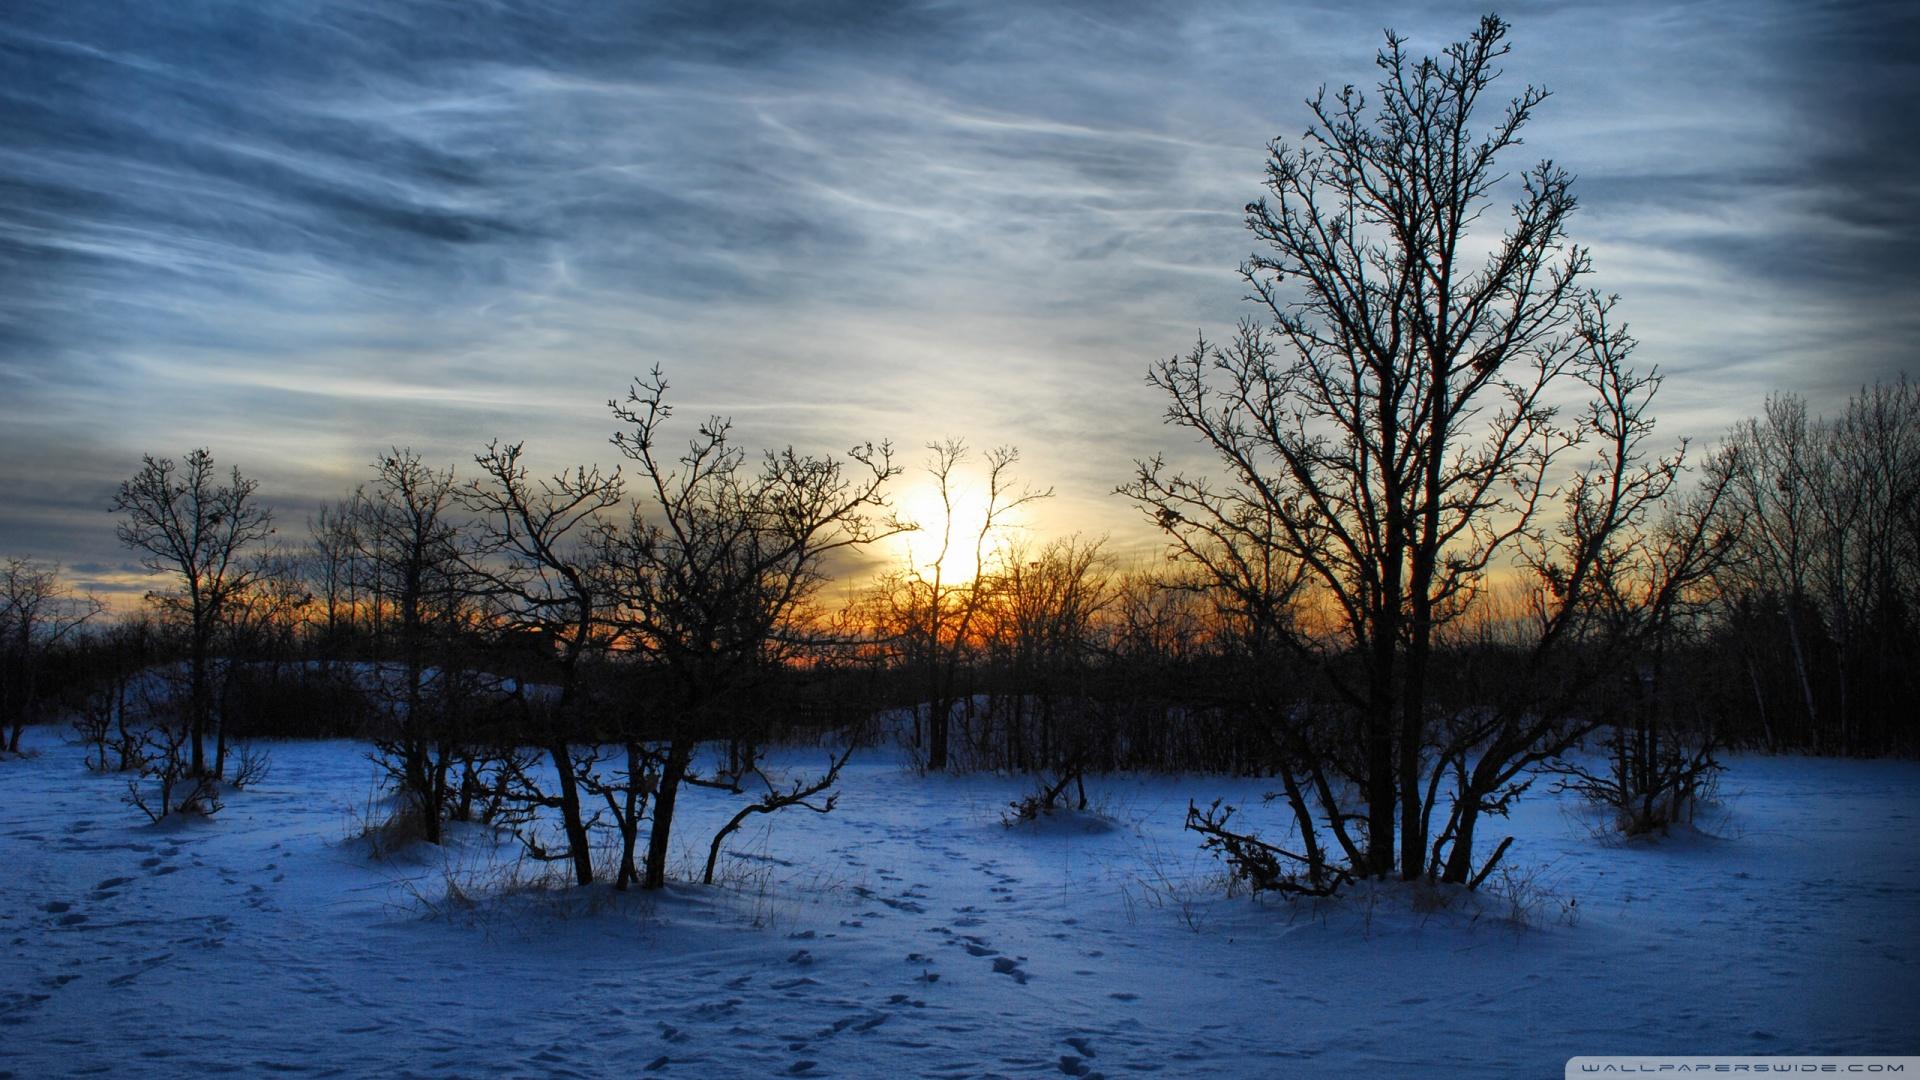 Early Winter Morn glorious winter sunset wallpaper   ForWallpapercom 1920x1080